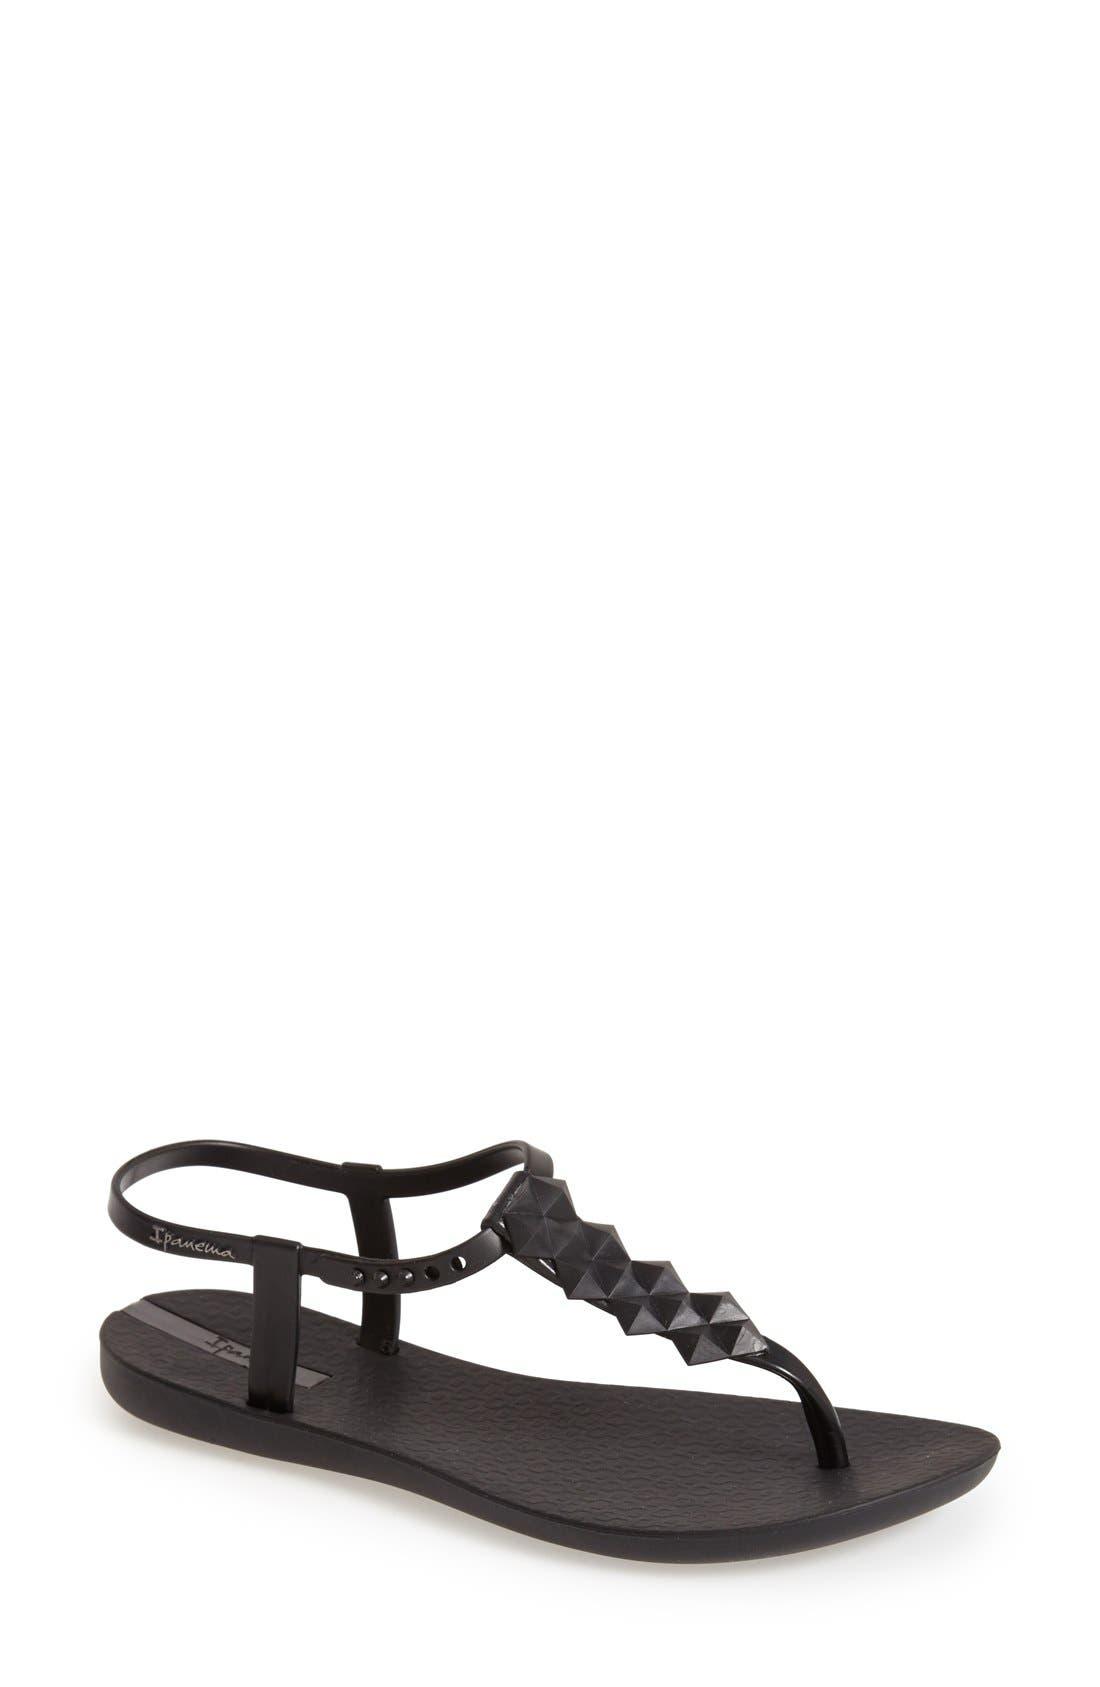 'Cleo' Pyramid Stud Ankle Strap Flip Flop,                         Main,                         color, Black